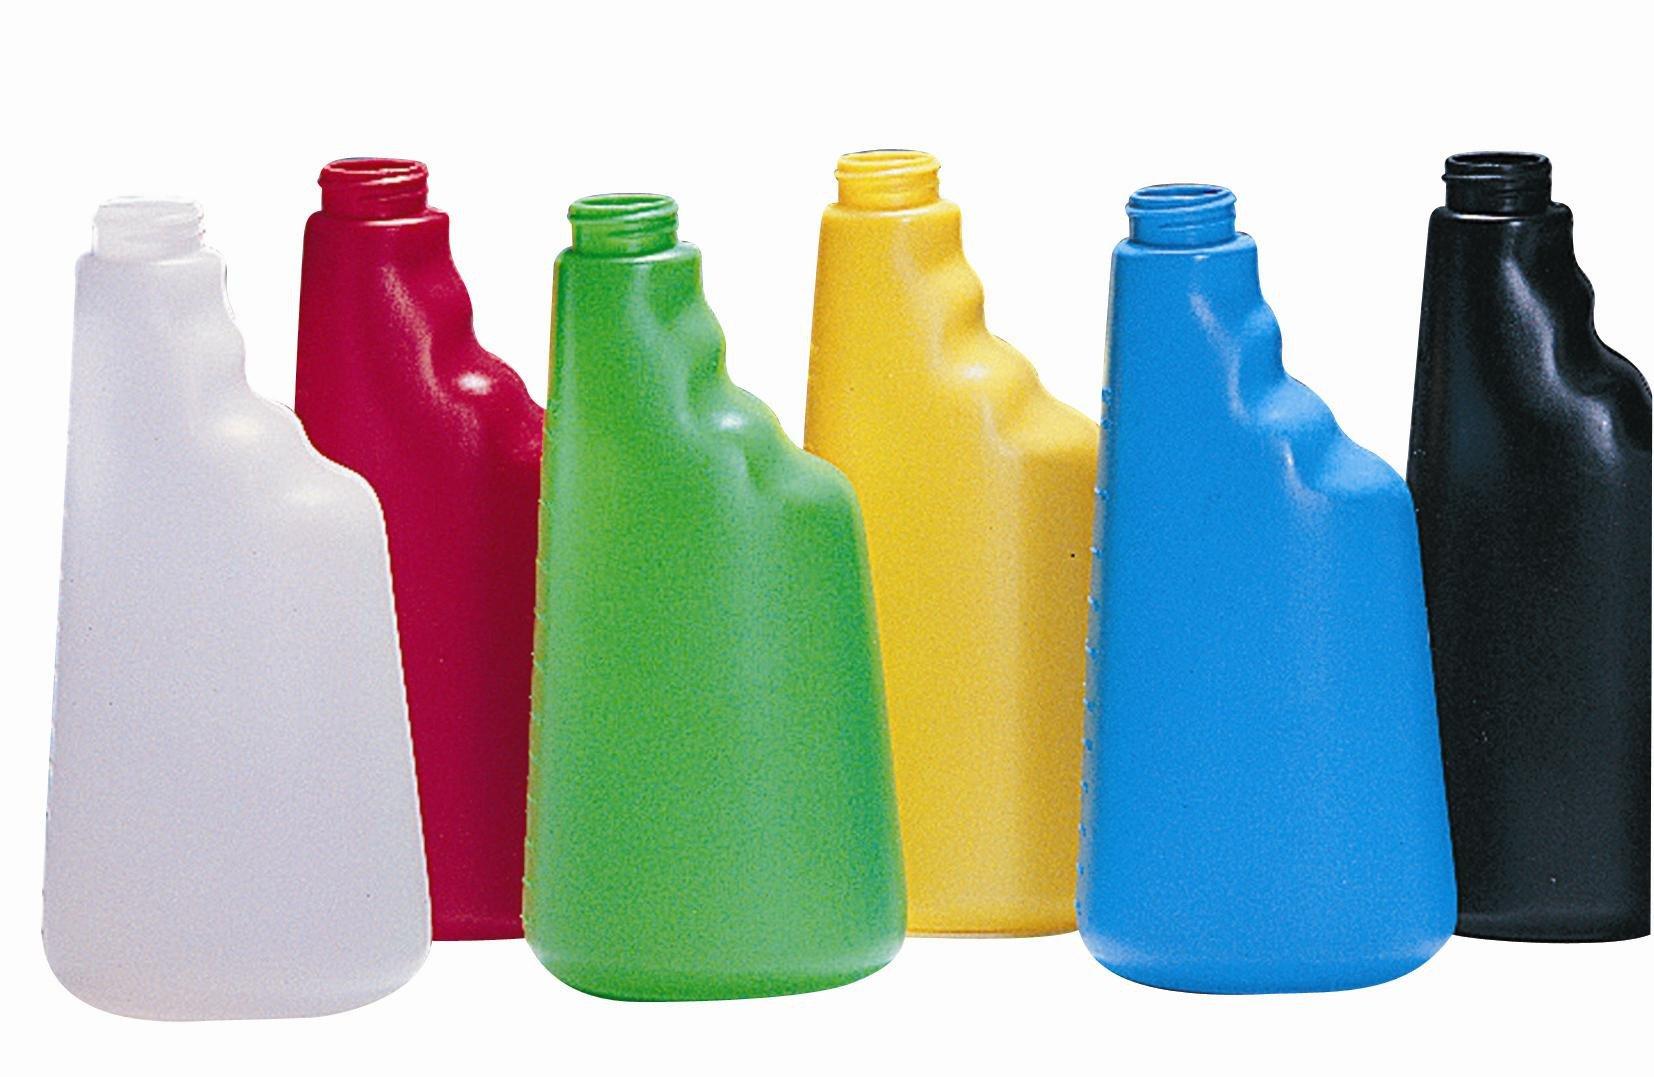 Trigger Spray Bottle Janitorial Direct Ltd